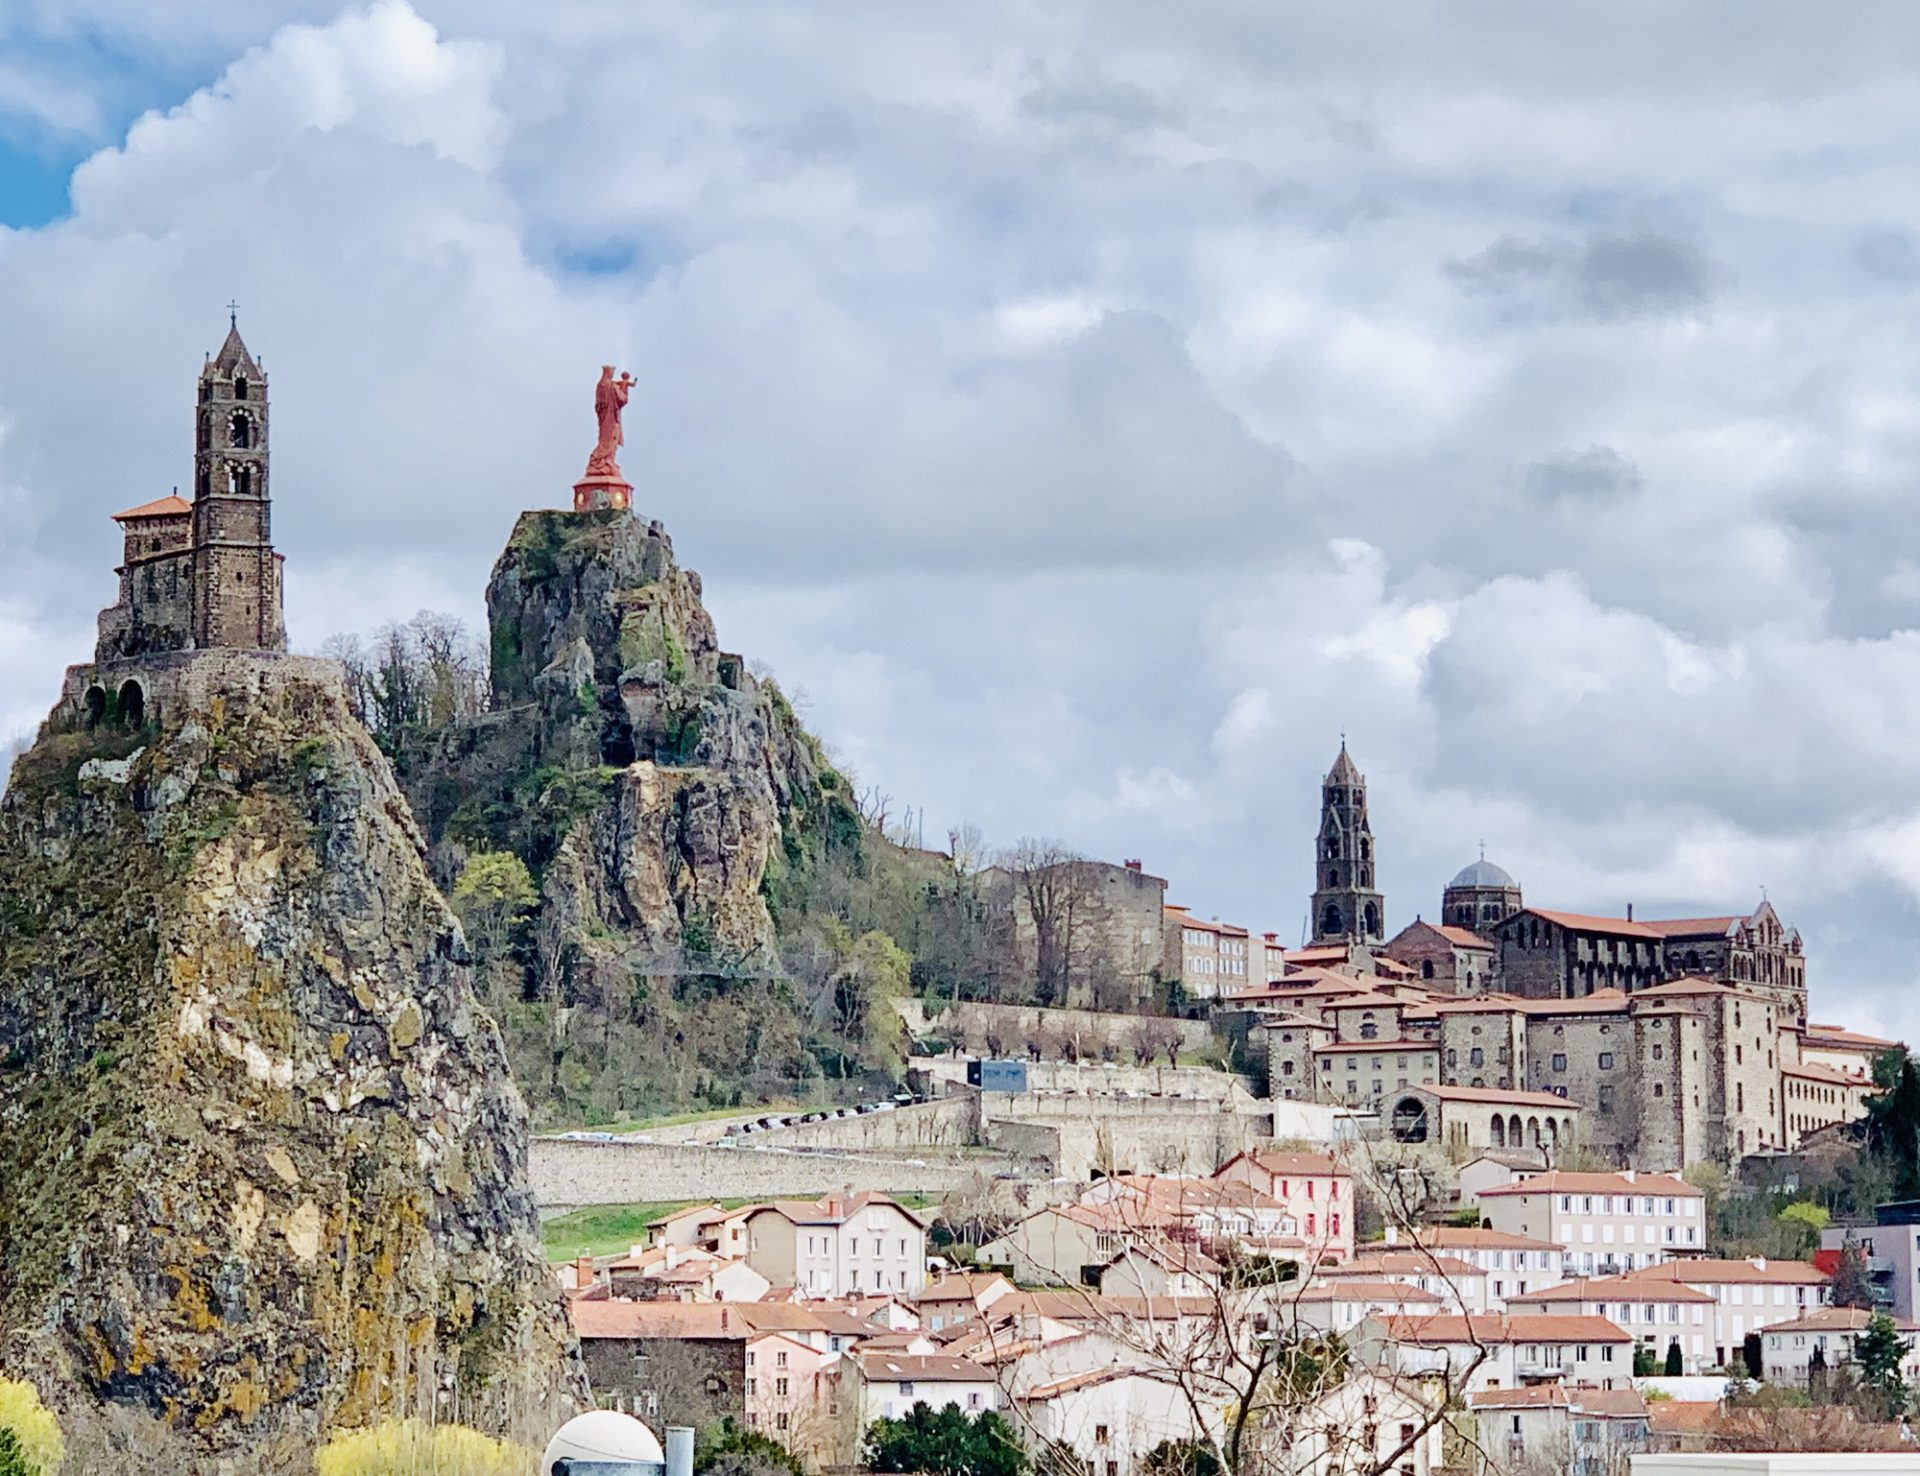 Le Puy en Velay – Buildings on the Shoulders of Giants